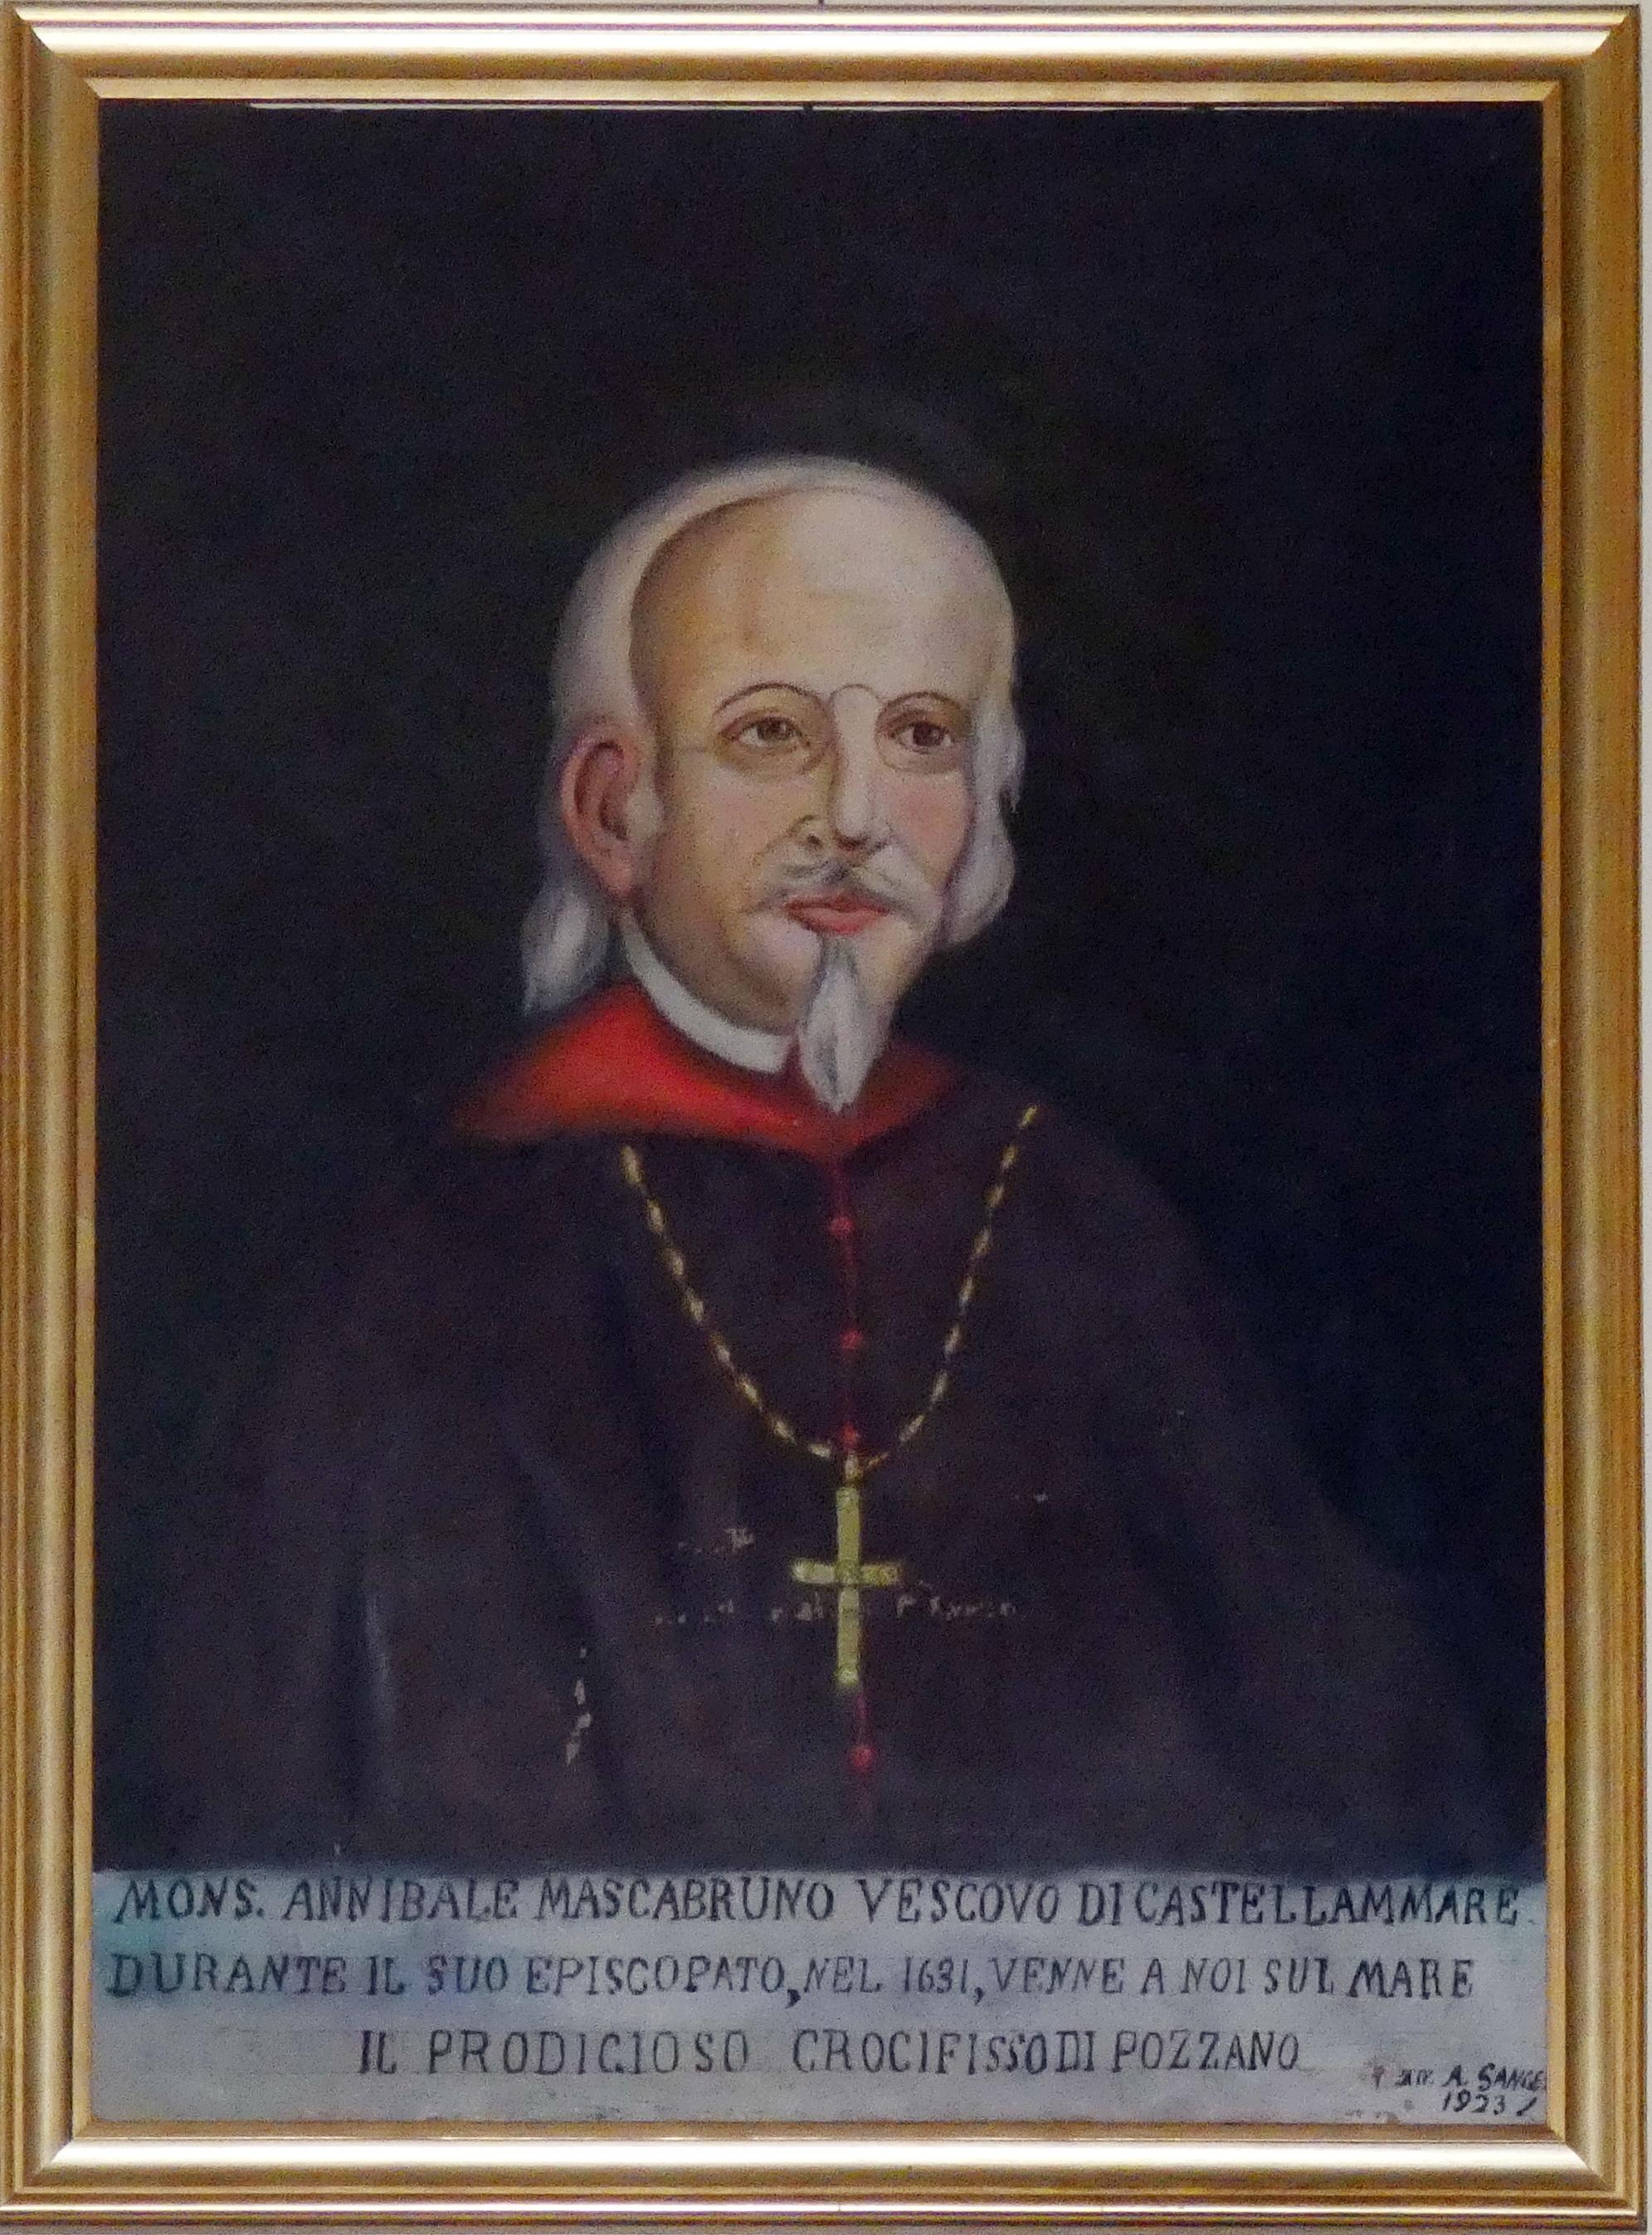 Monsigno Annibale Mascambruno, dipinto di A. Sanges 1923